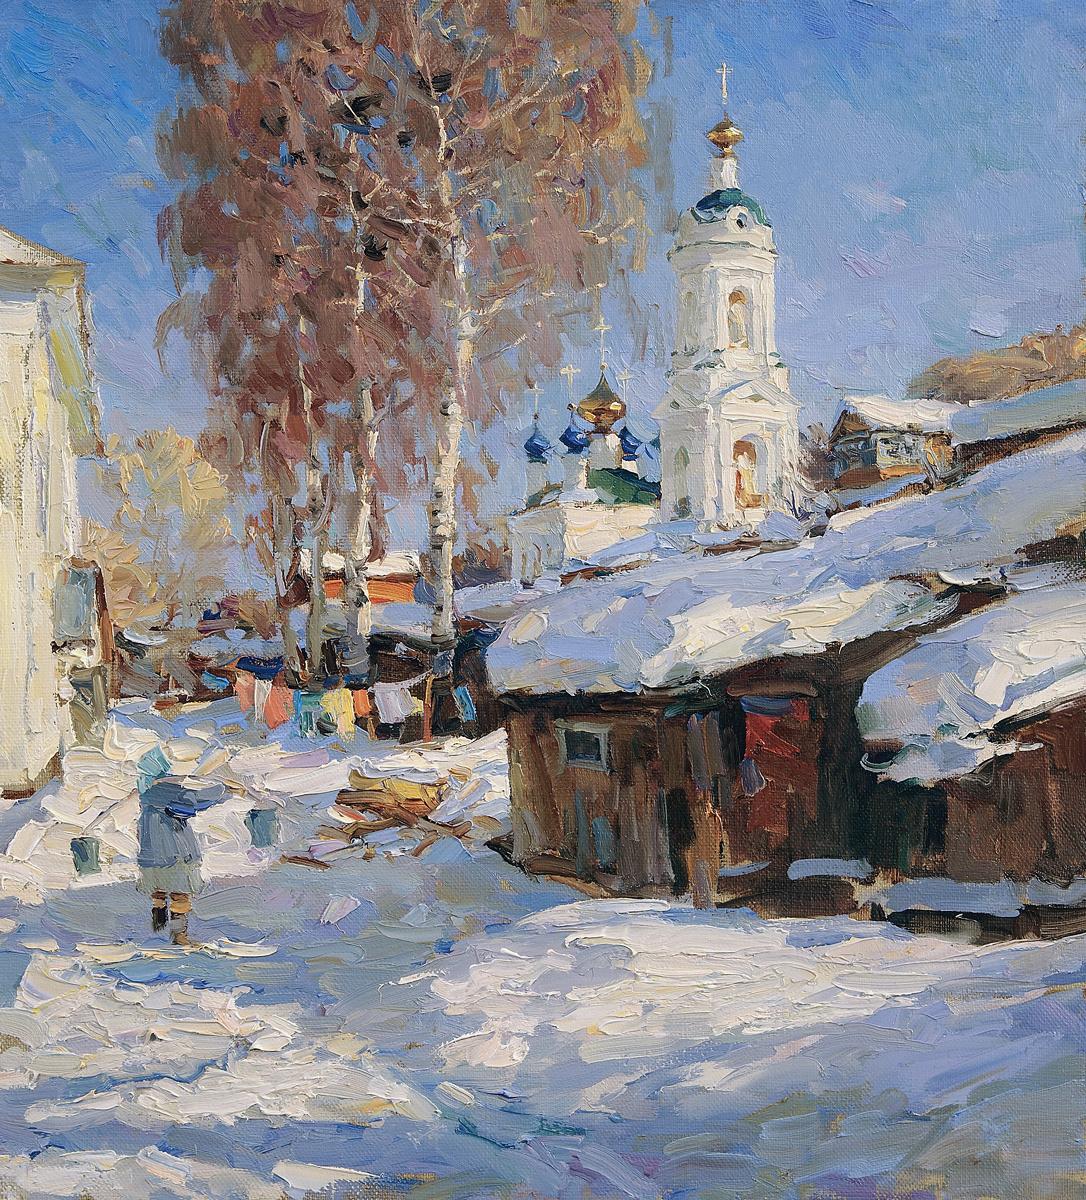 Alexander Victorovich Shevelyov. Ples.Saint Barbara. Oil on canvas 34.5 x 37.7 cm. 2012